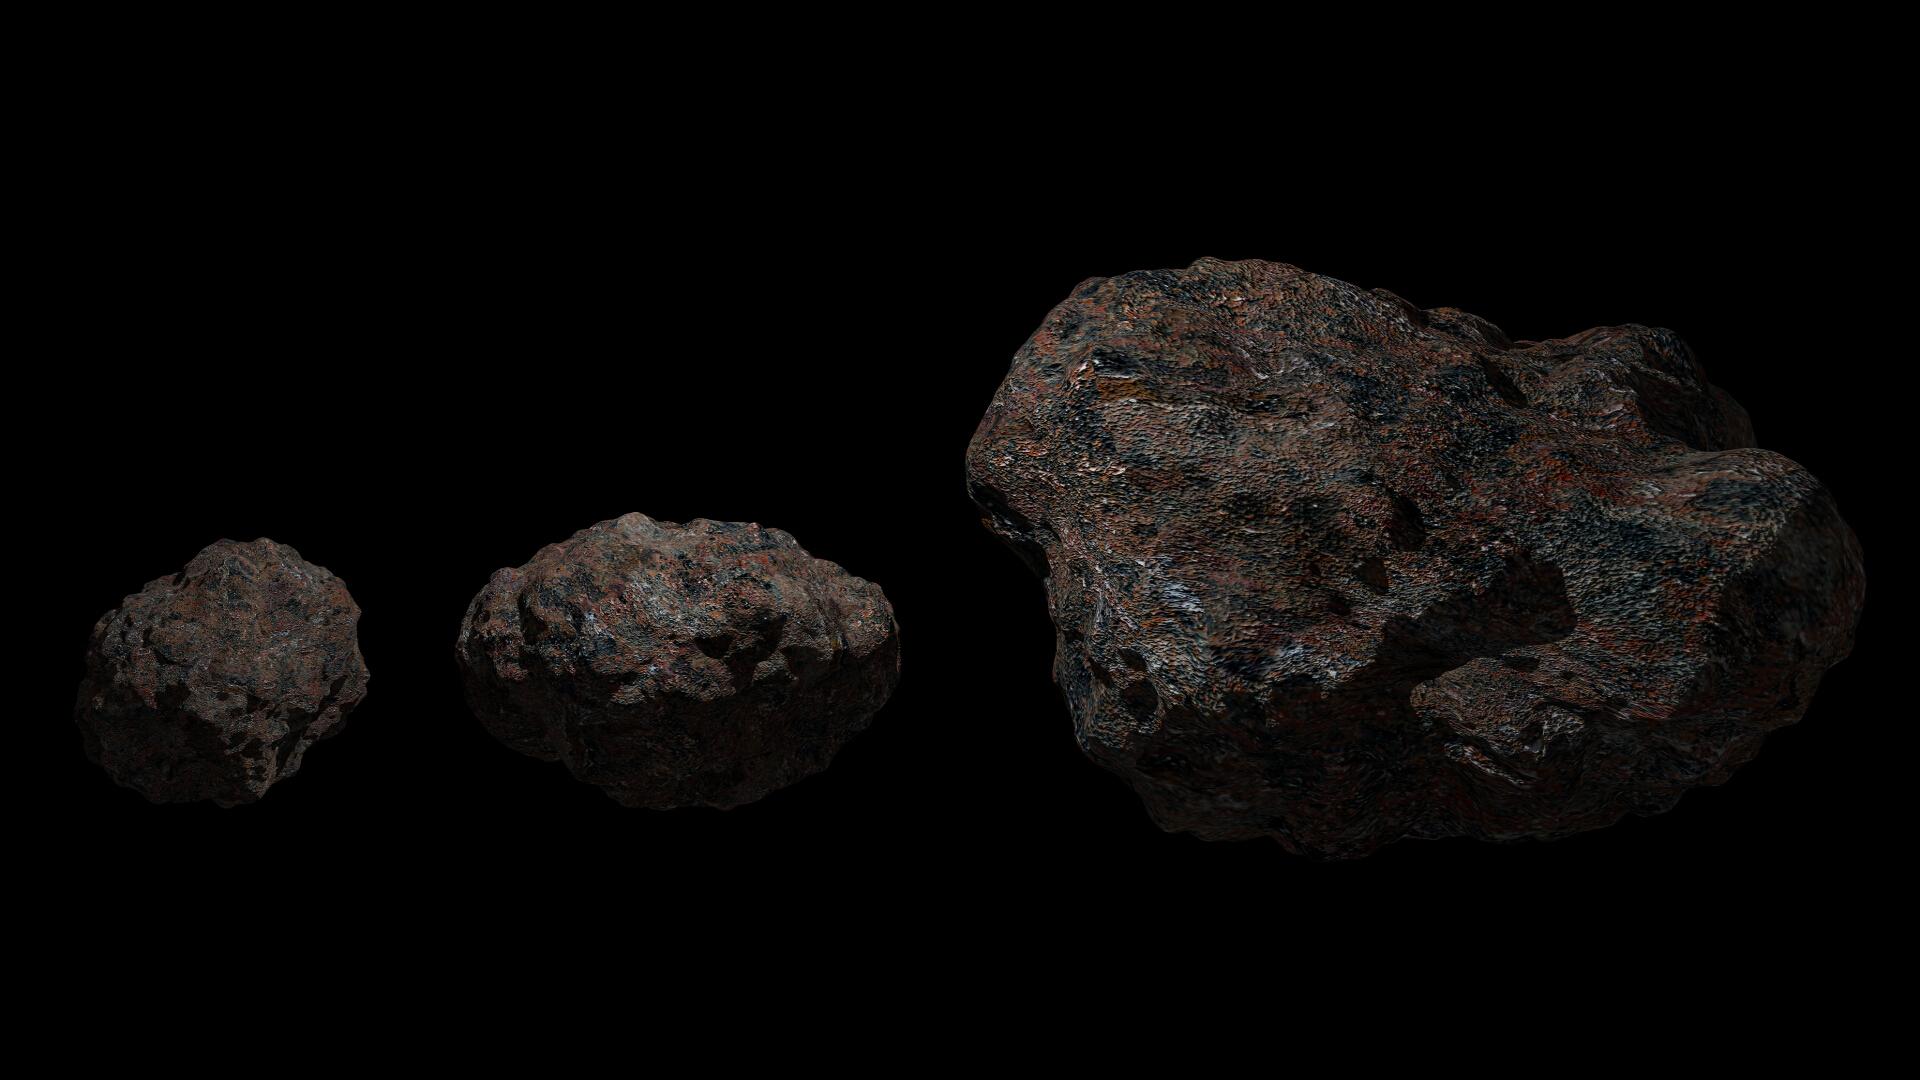 fantasy asteroid 3 3d model 3ds fbx dae obj 267326